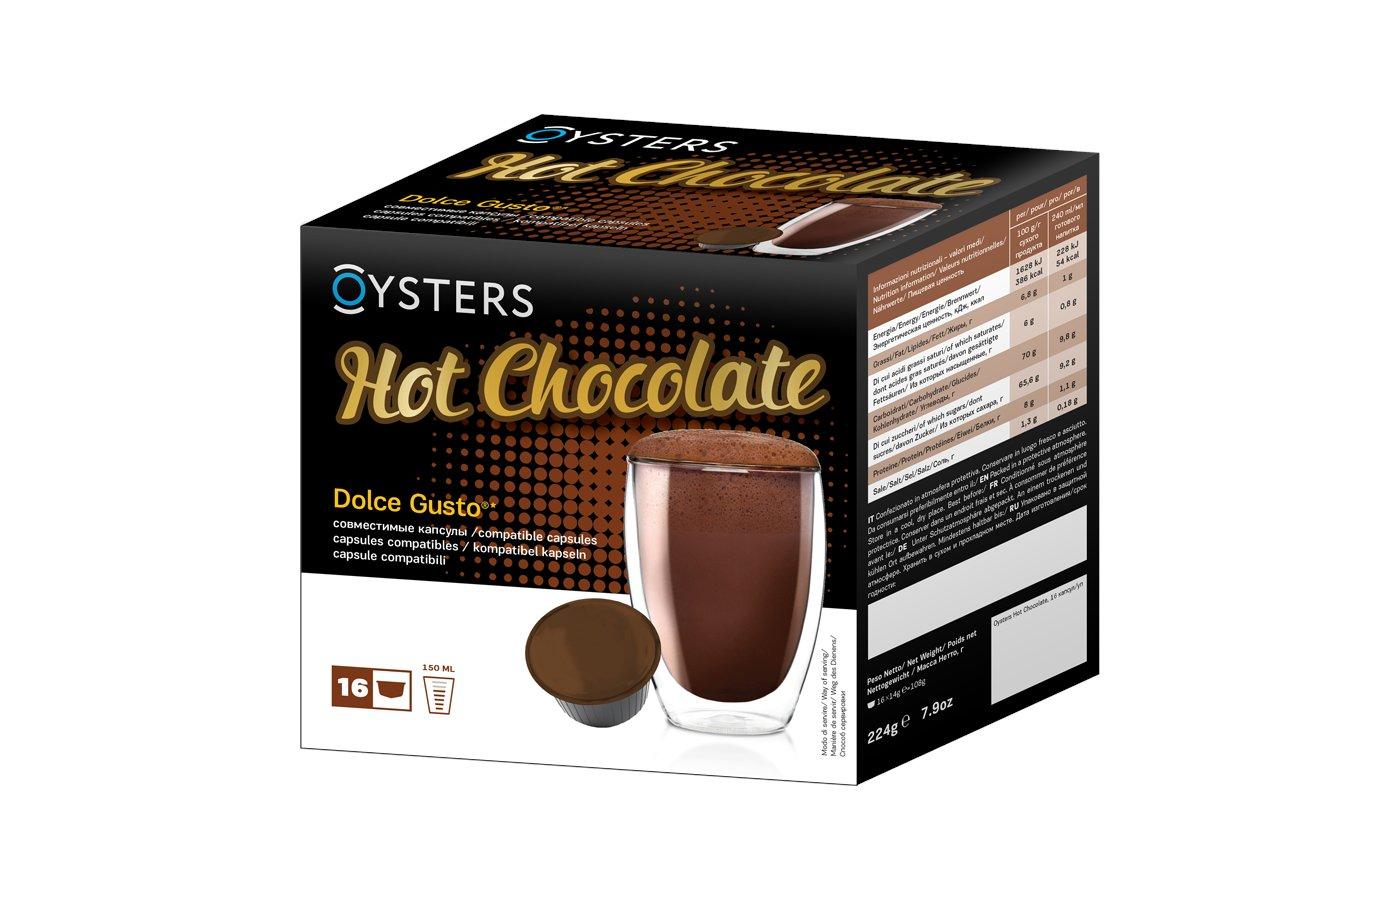 капсулы для кофеварок Oysters Hot Chocolate 16 капсул